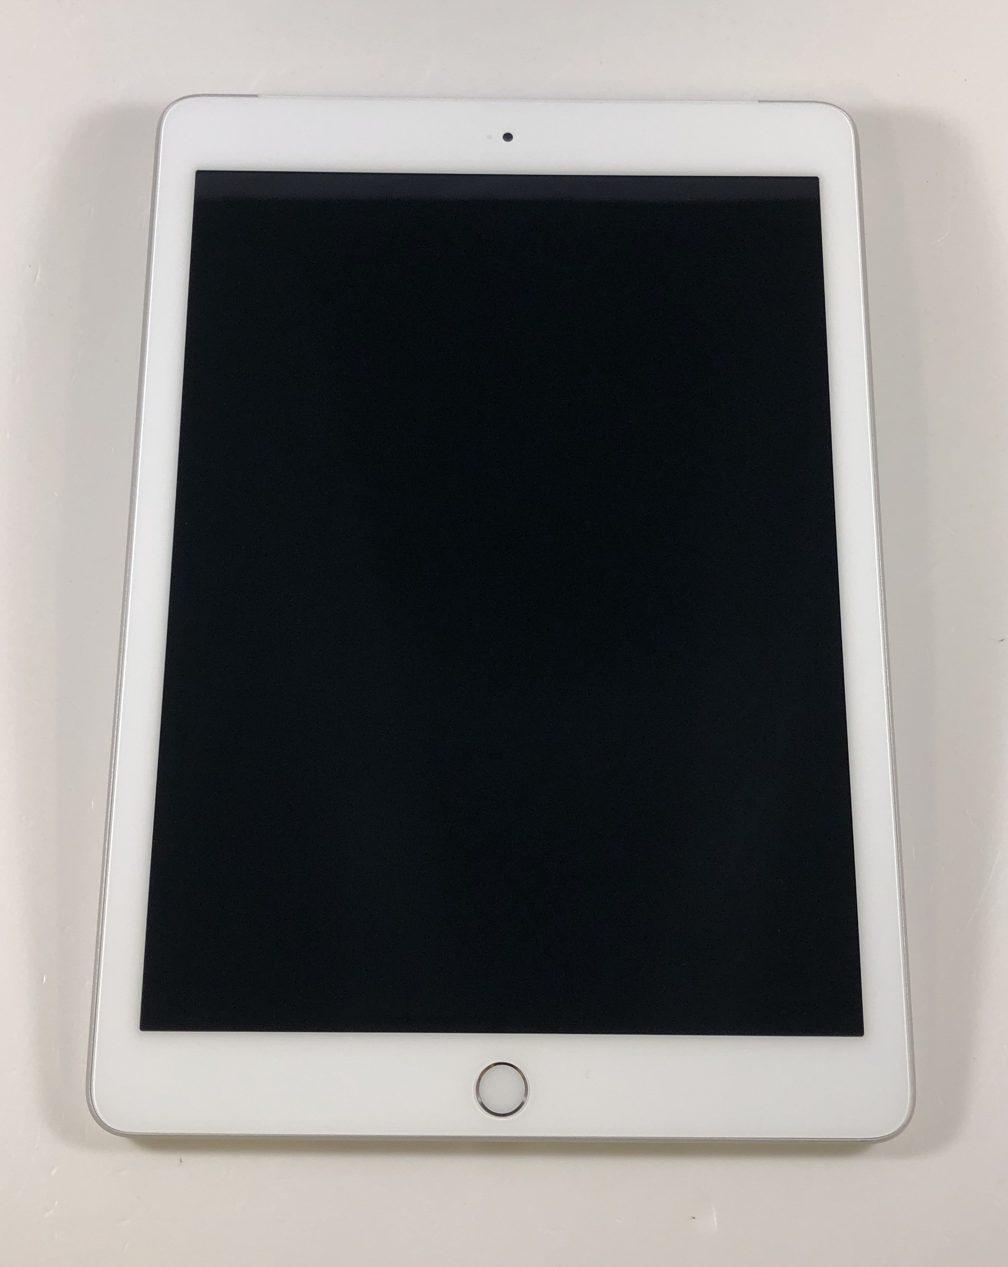 iPad 5 Wi-Fi + Cellular 128GB, 128GB, Silver, bild 1